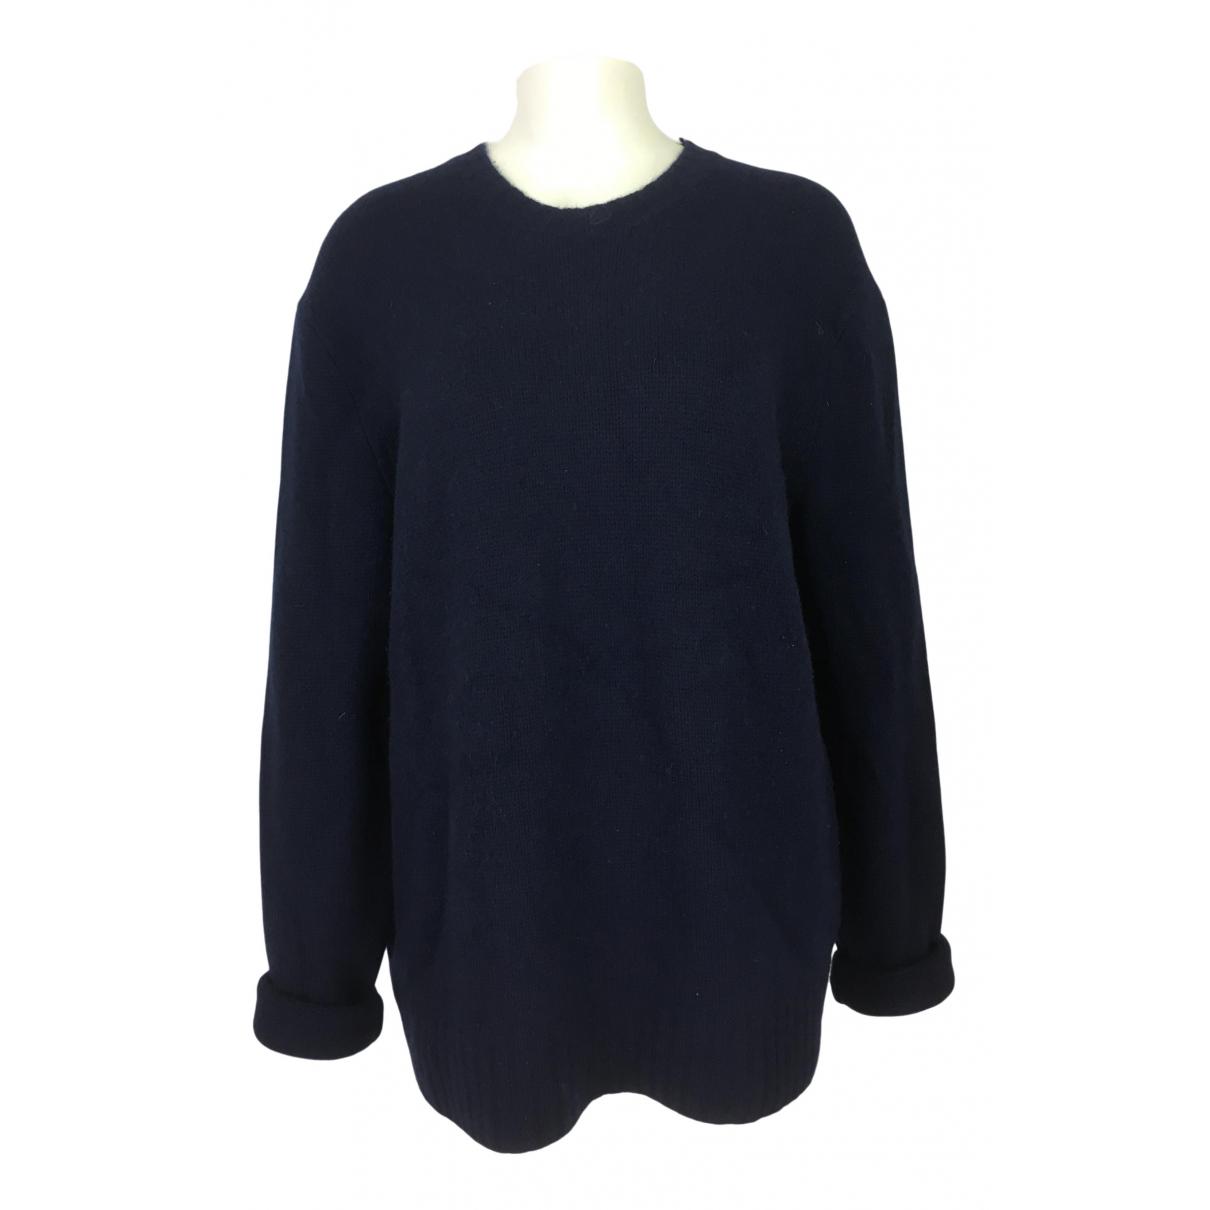 Polo Ralph Lauren \N Navy Cashmere Knitwear & Sweatshirts for Men XL International